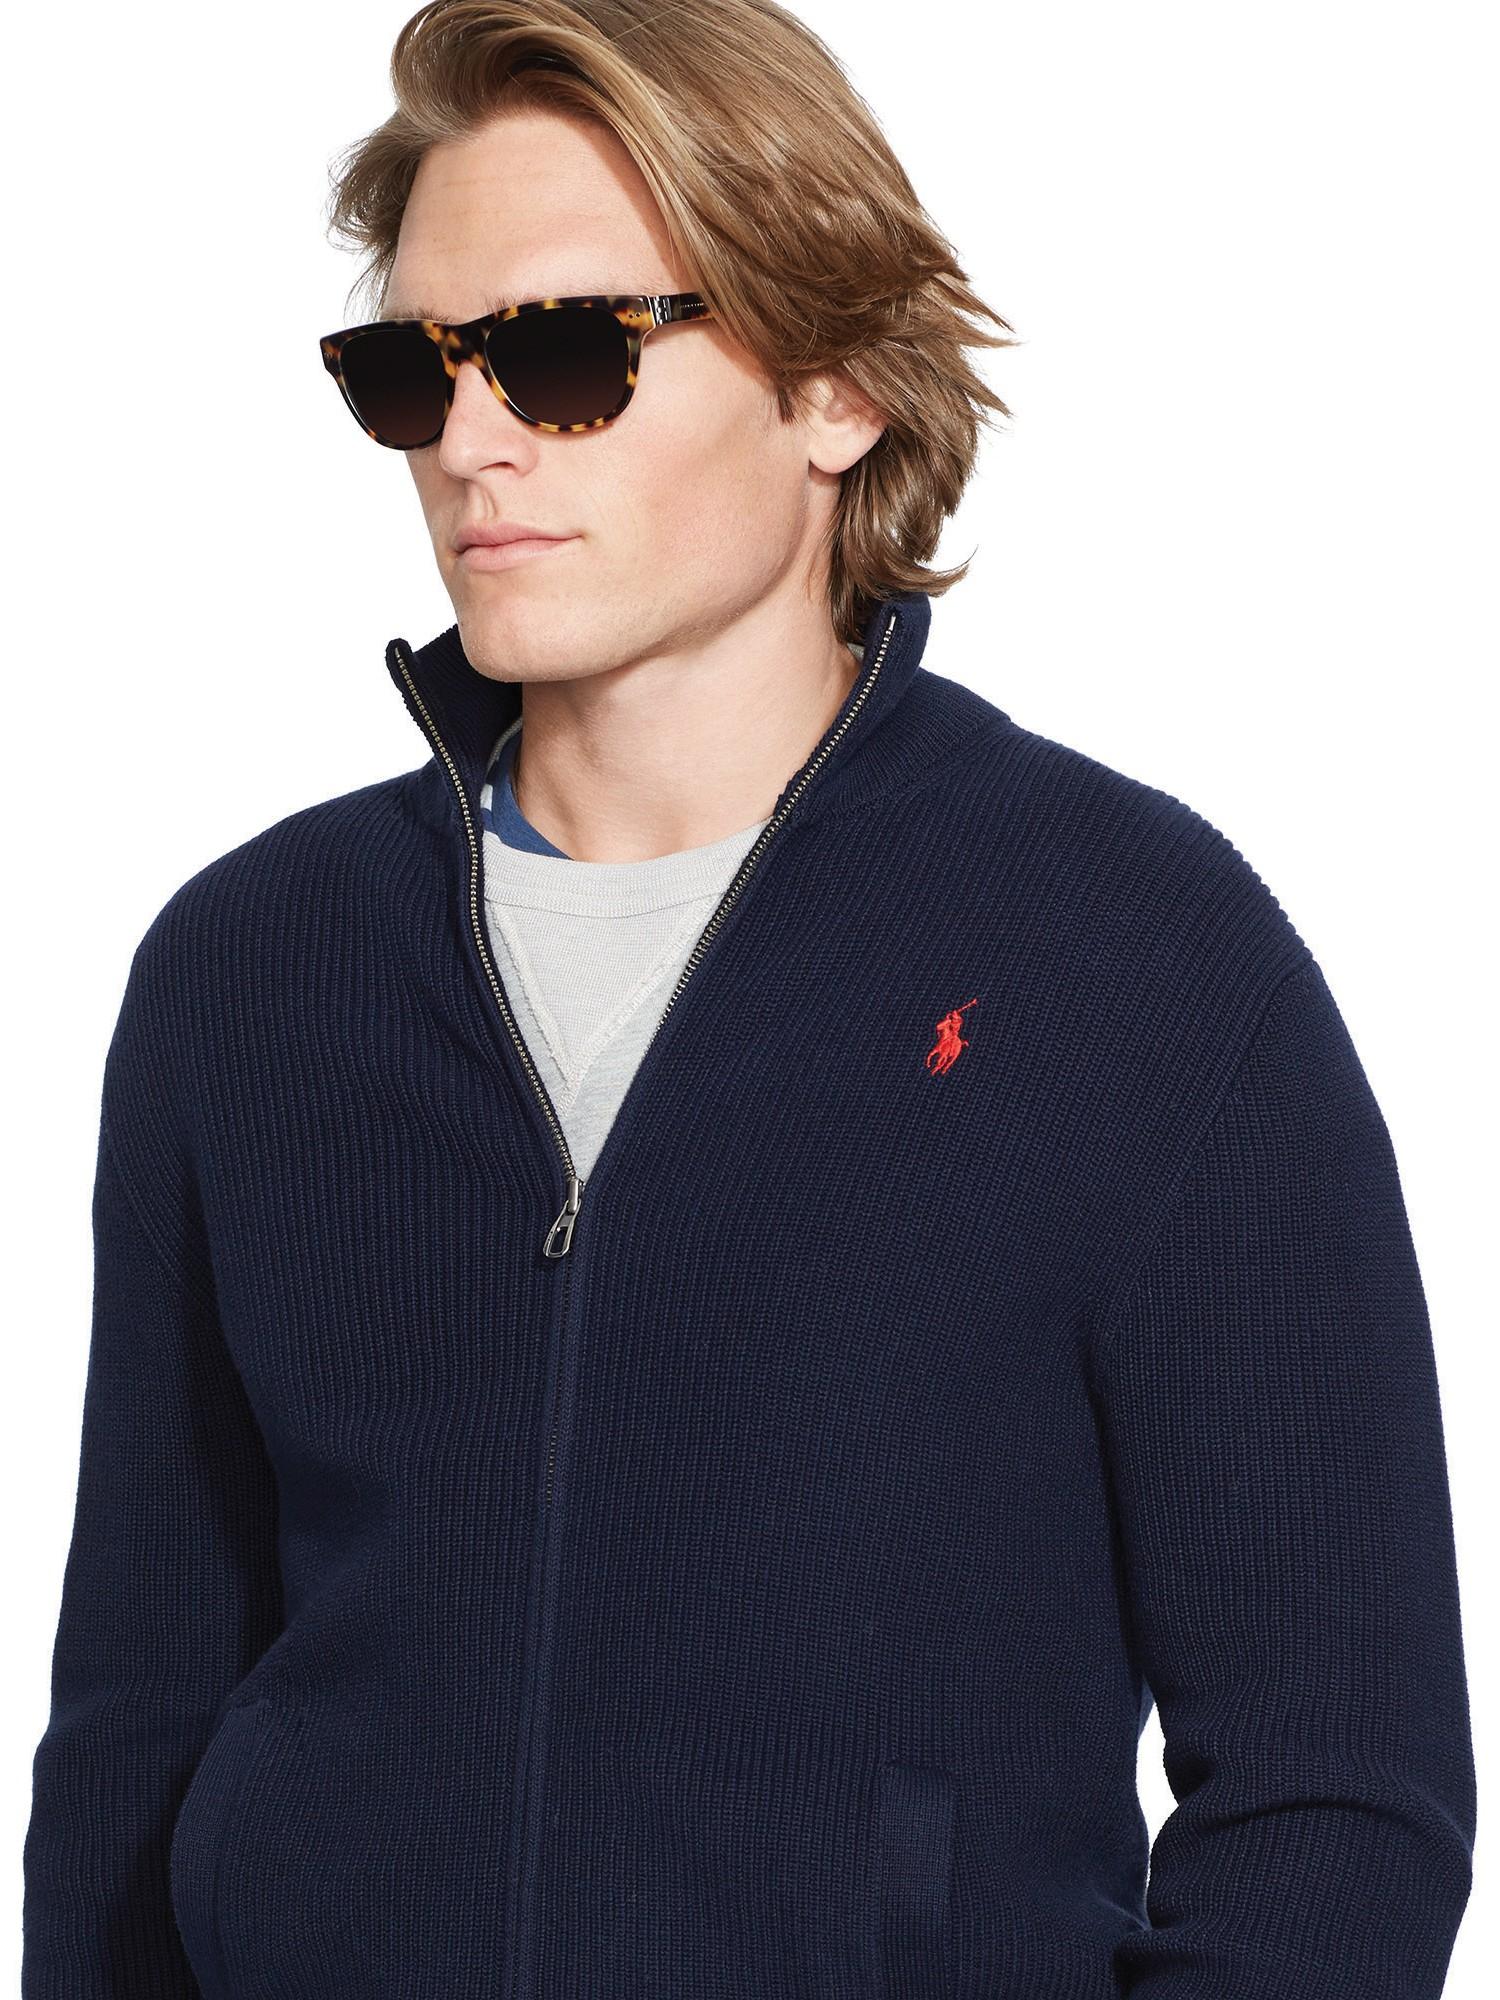 3b8ce97275d Polo Ralph Lauren Full Zip Cotton Cardigan in Blue for Men - Lyst